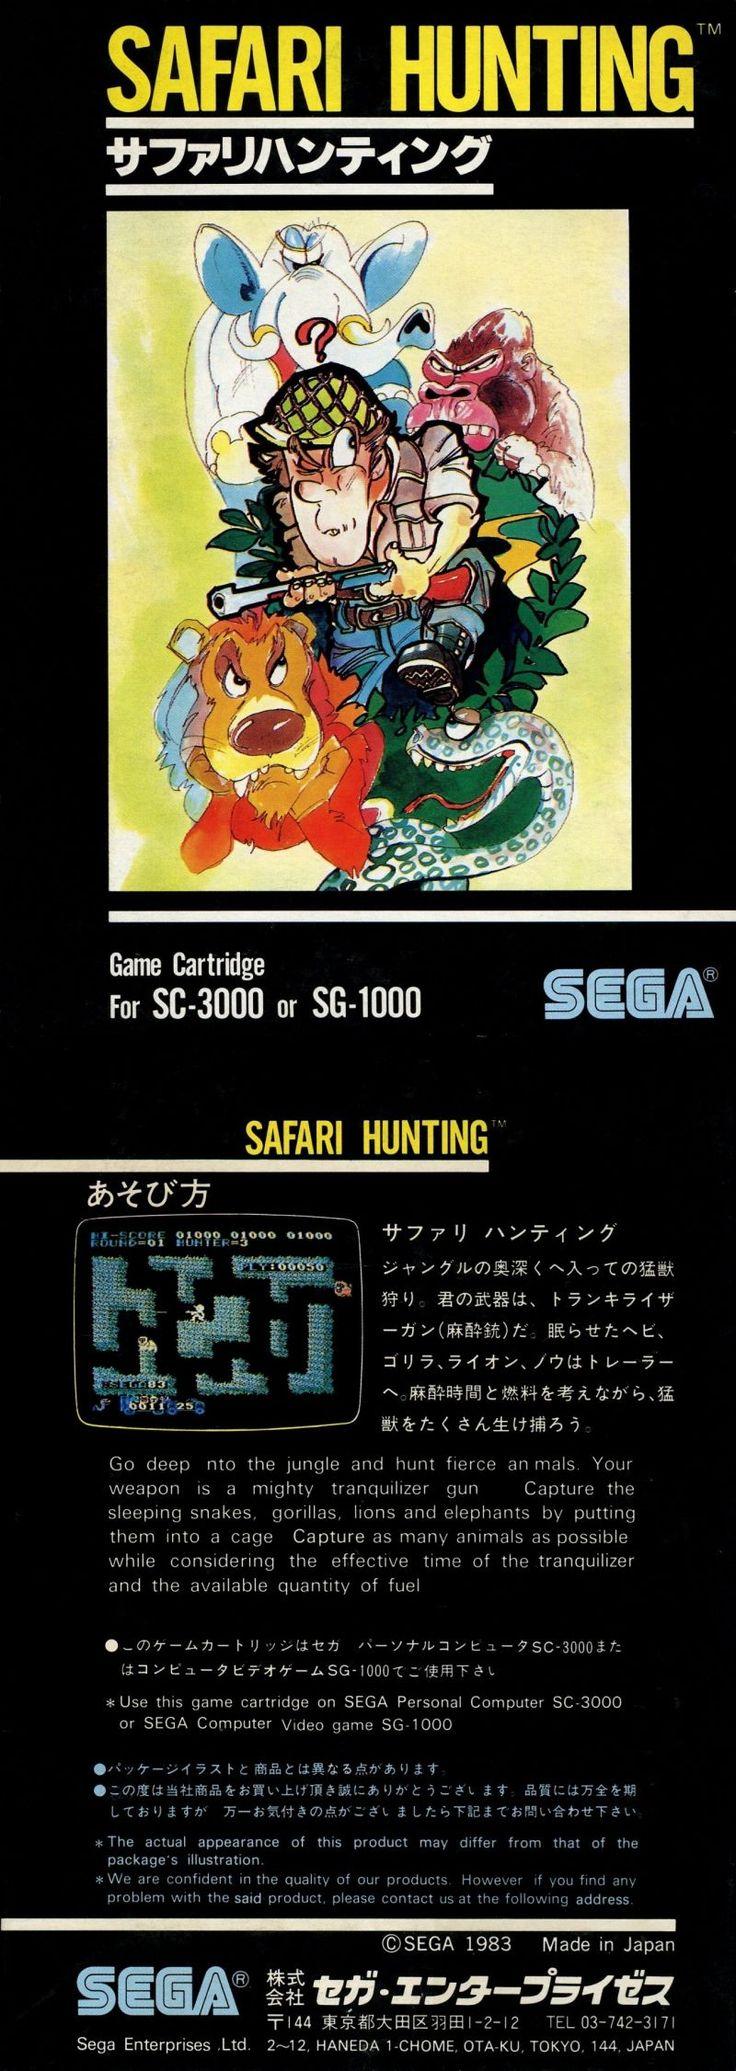 (covers) Safari Hunting, SG-1000, Sega, 1983 #80s #sega #sg1000 #console #retrogaming #mastersystem